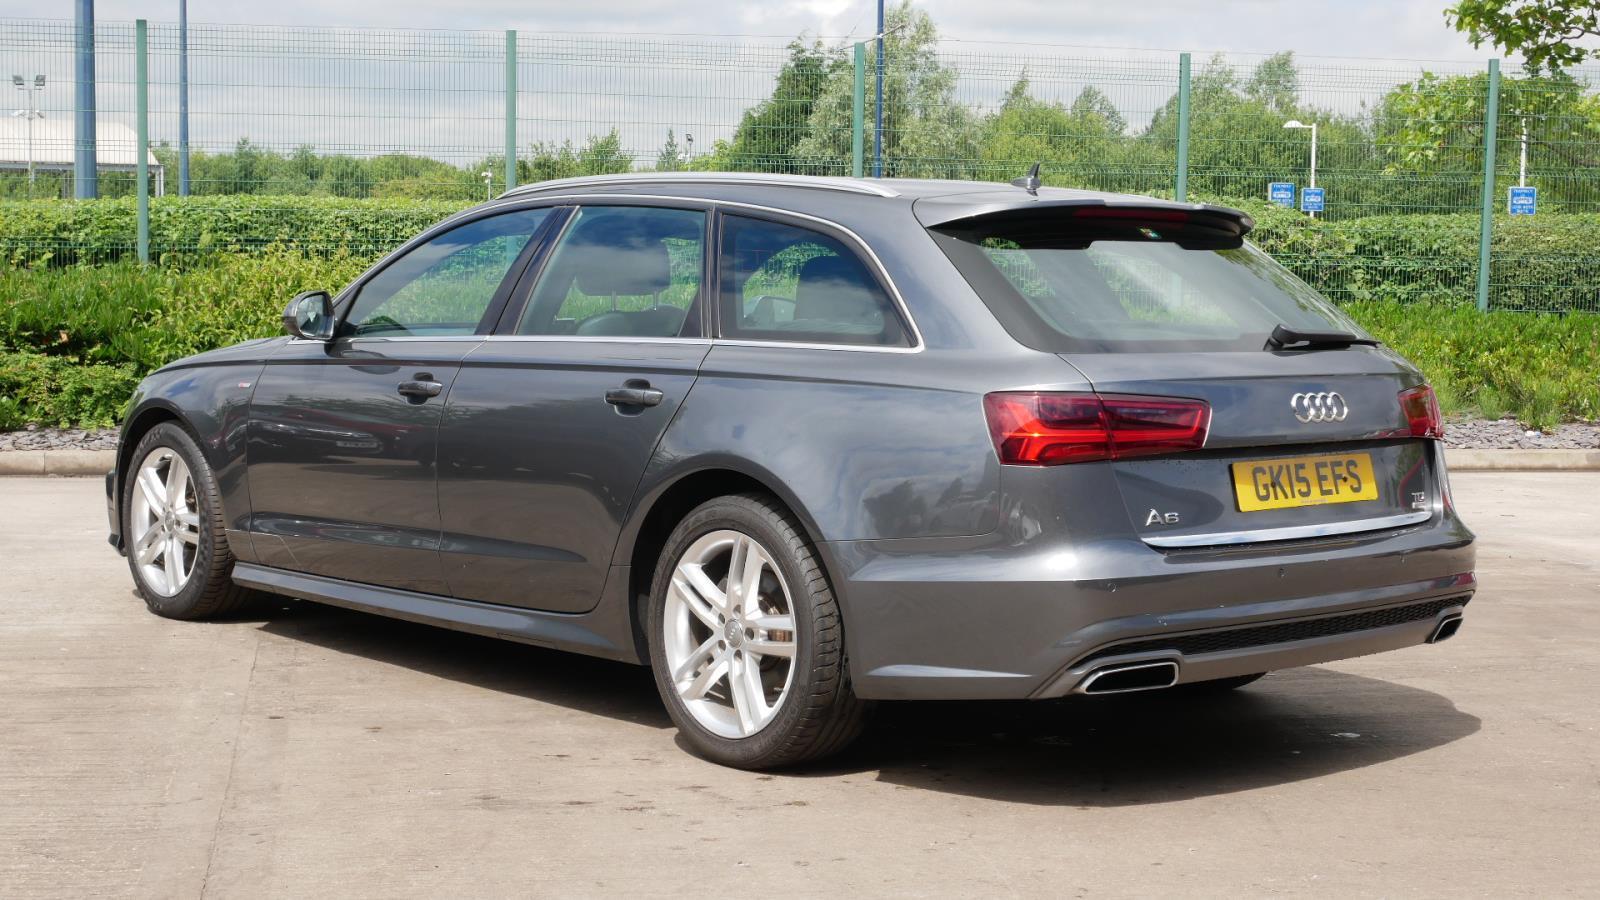 quality design 70e61 5df34 Used AUDI A6 2.0 TDI Ultra S Line 5dr | Grey | GK15EFS ...